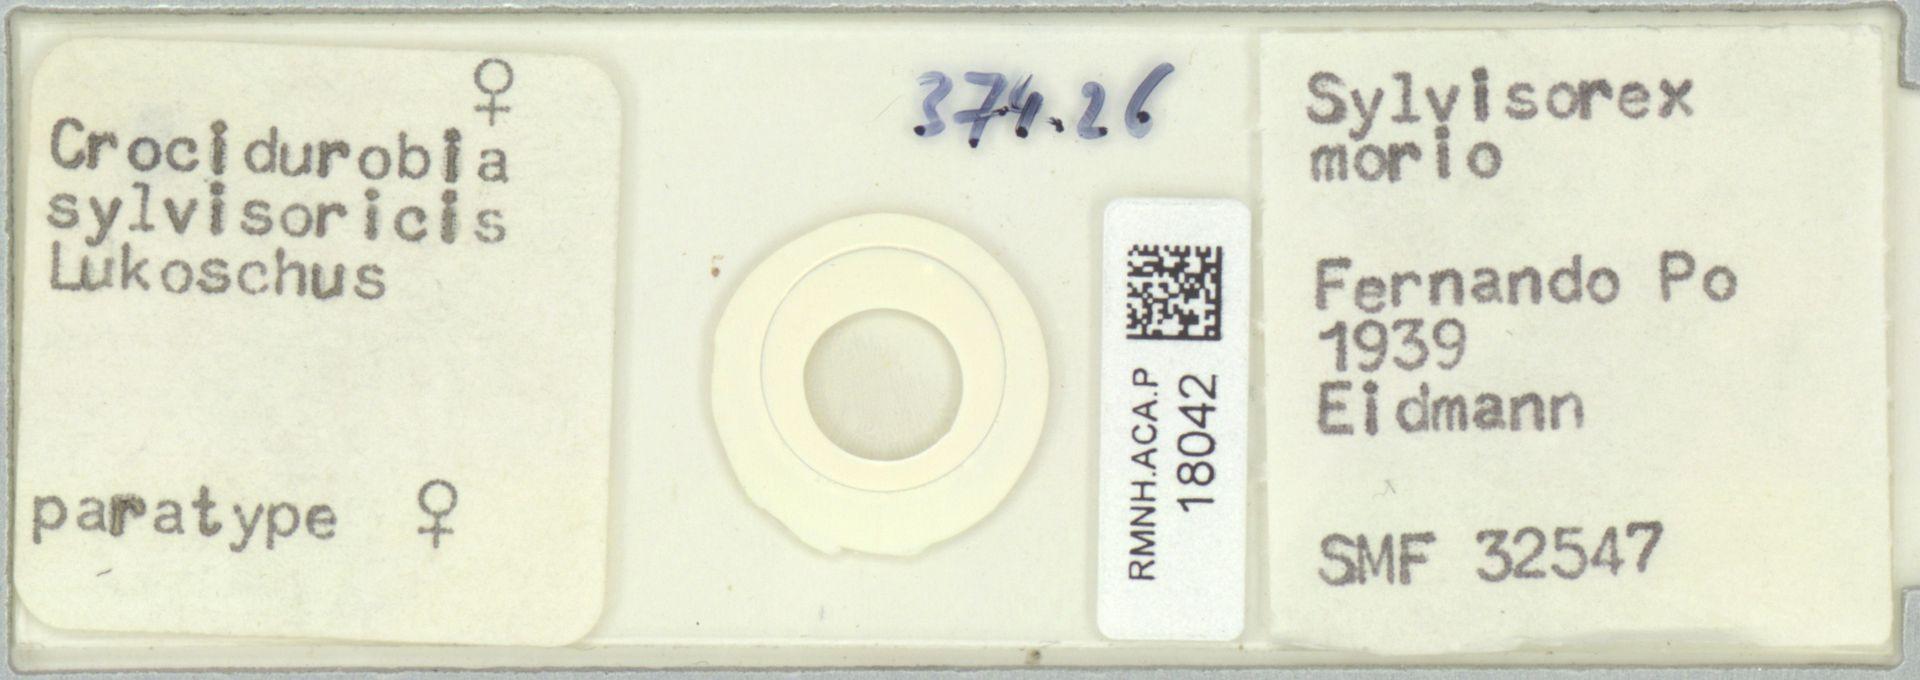 RMNH.ACA.P.18042 | Crocidurobia sylvisoricis